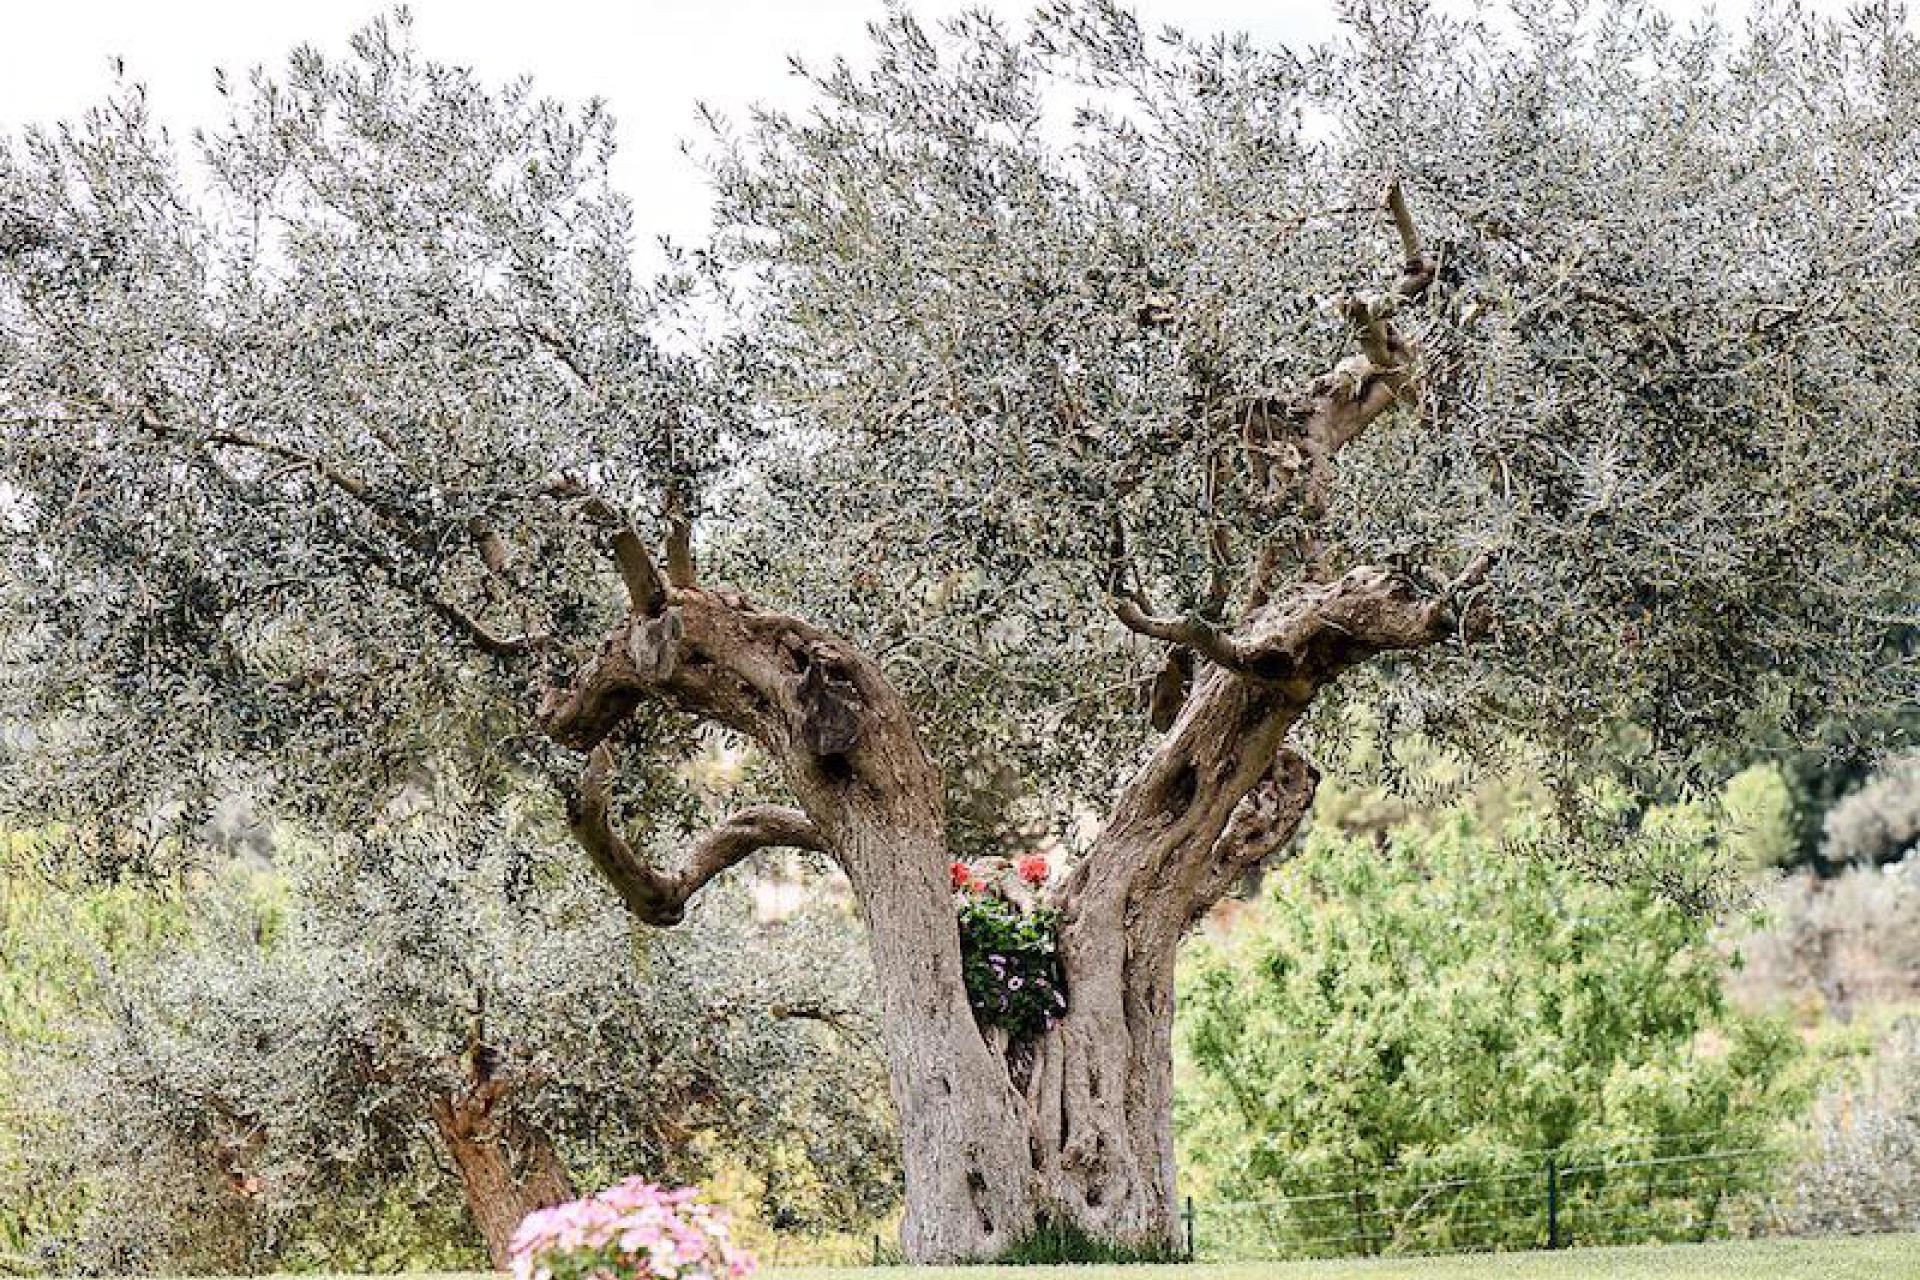 Agriturismo Sicilia Agriturismo accogliente nascosto tra mandorli e ulivi